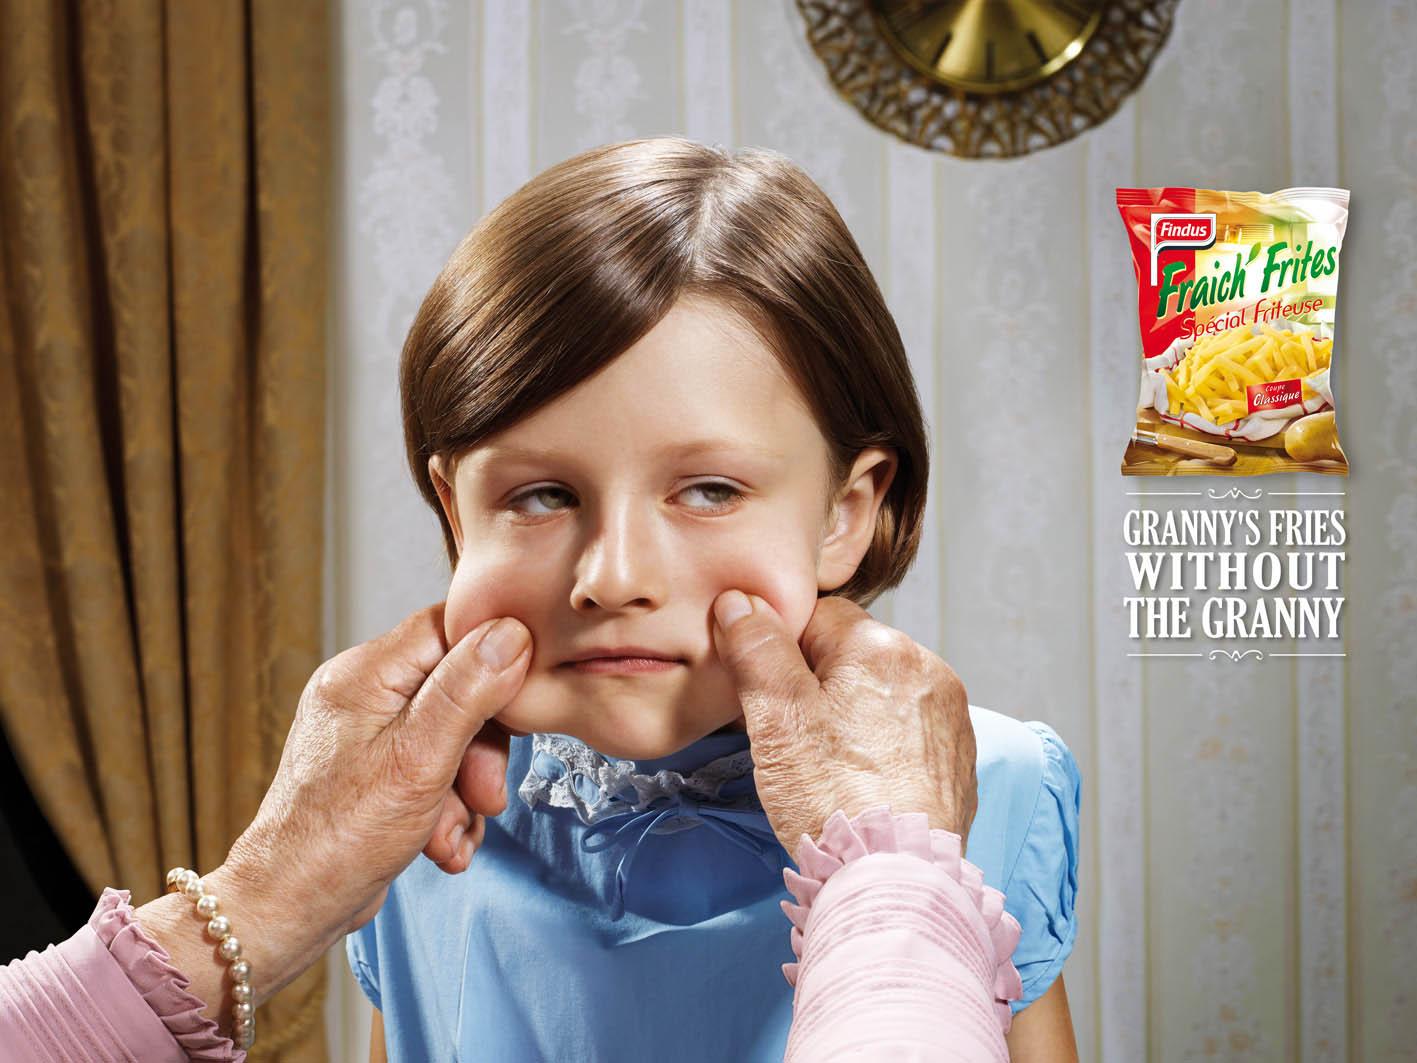 Funny-Print-Ads-12